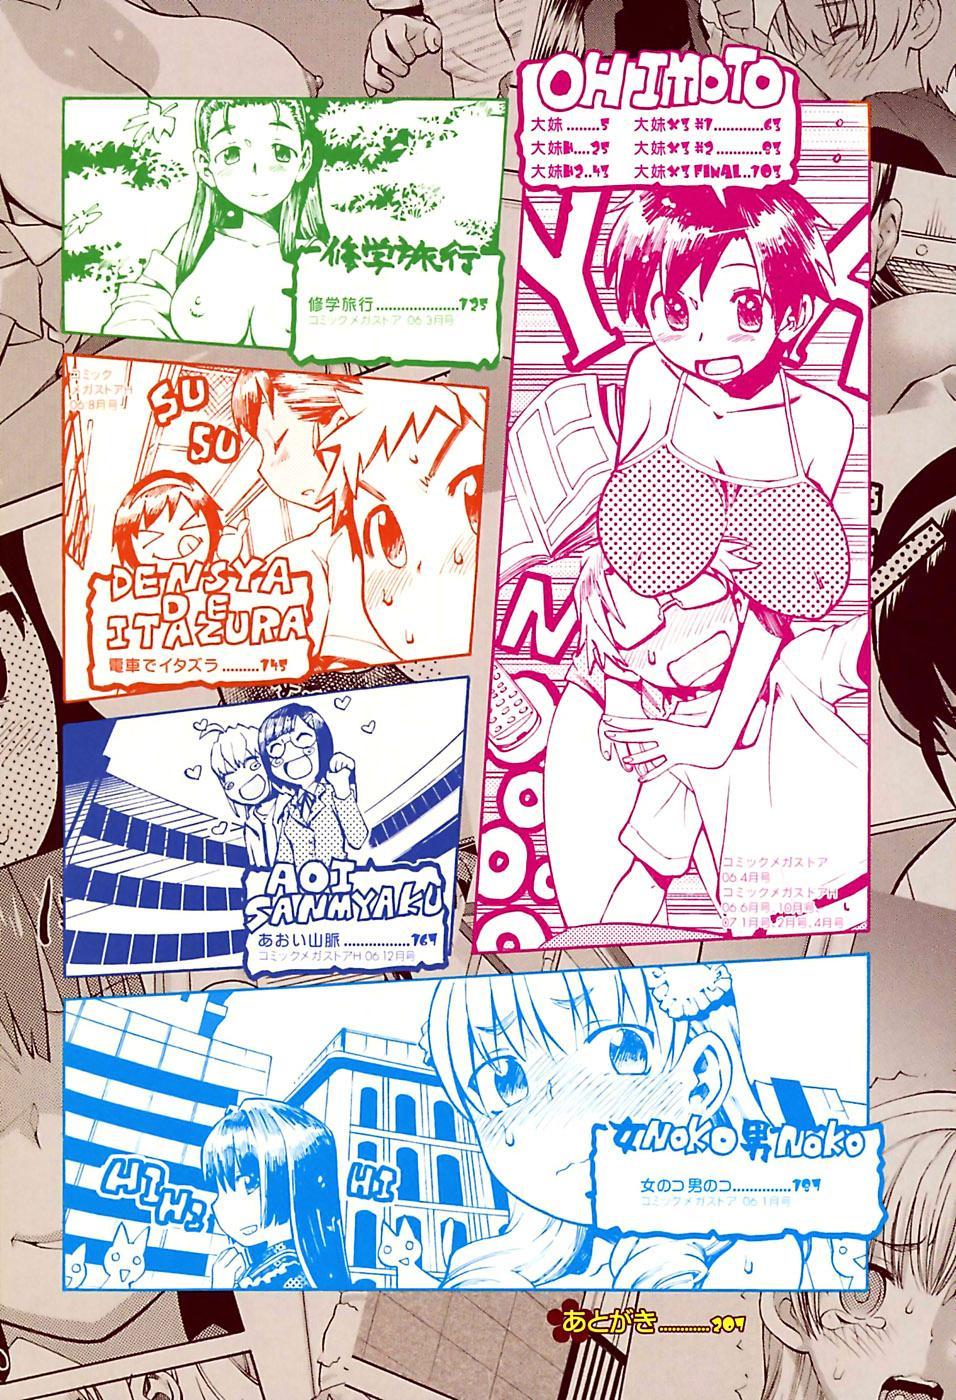 Oh! Imoto 4